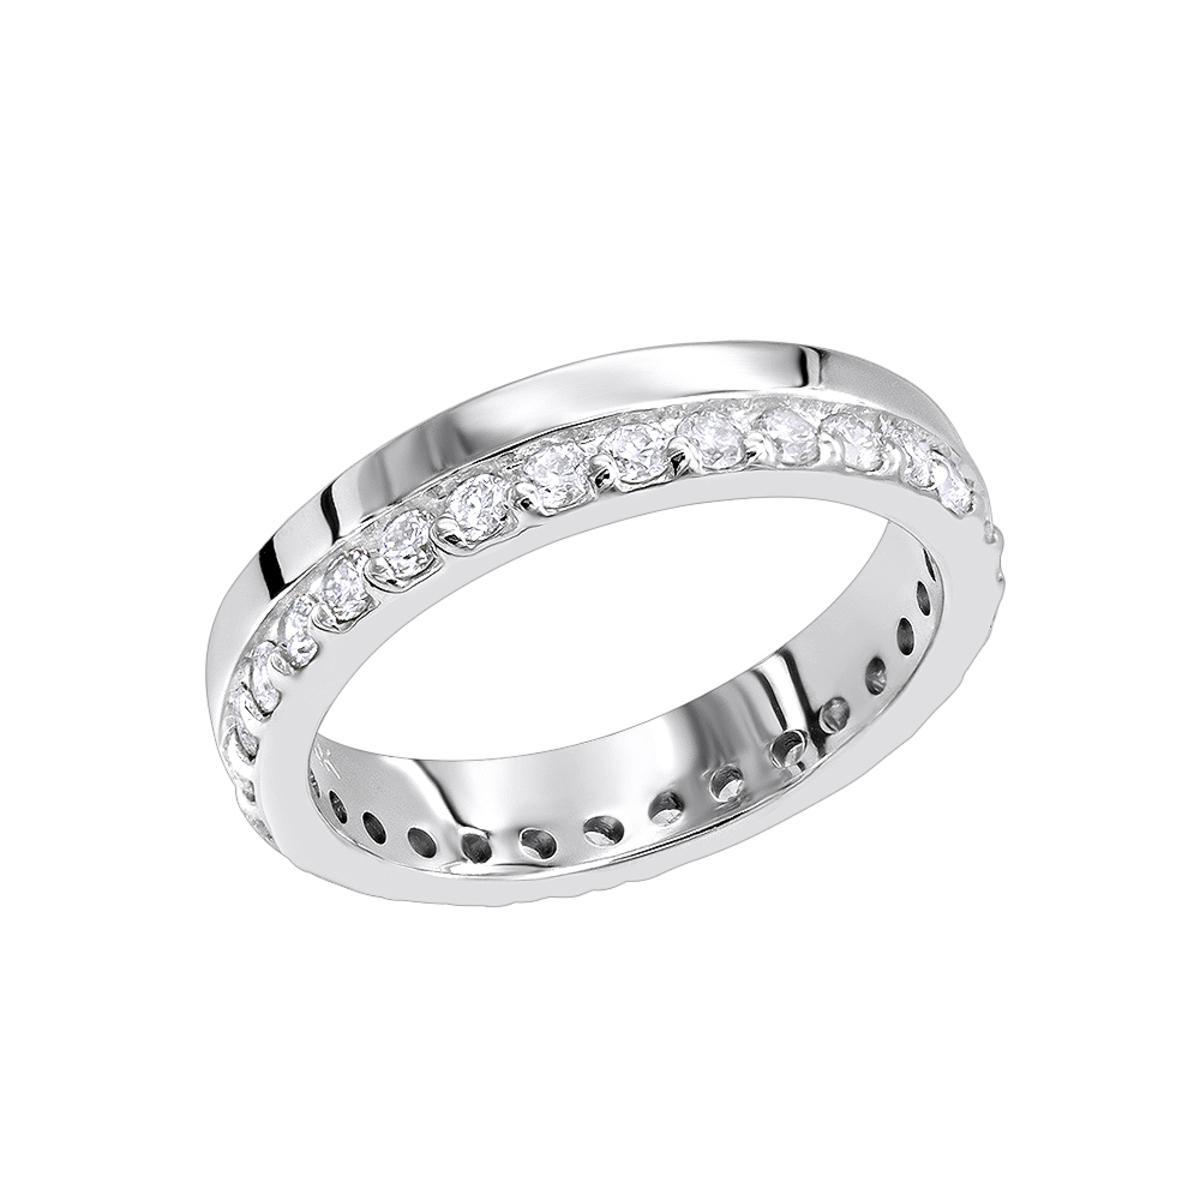 Thin Diamond Eternity Bands 14K Gold Eternity Ring 0.57ct